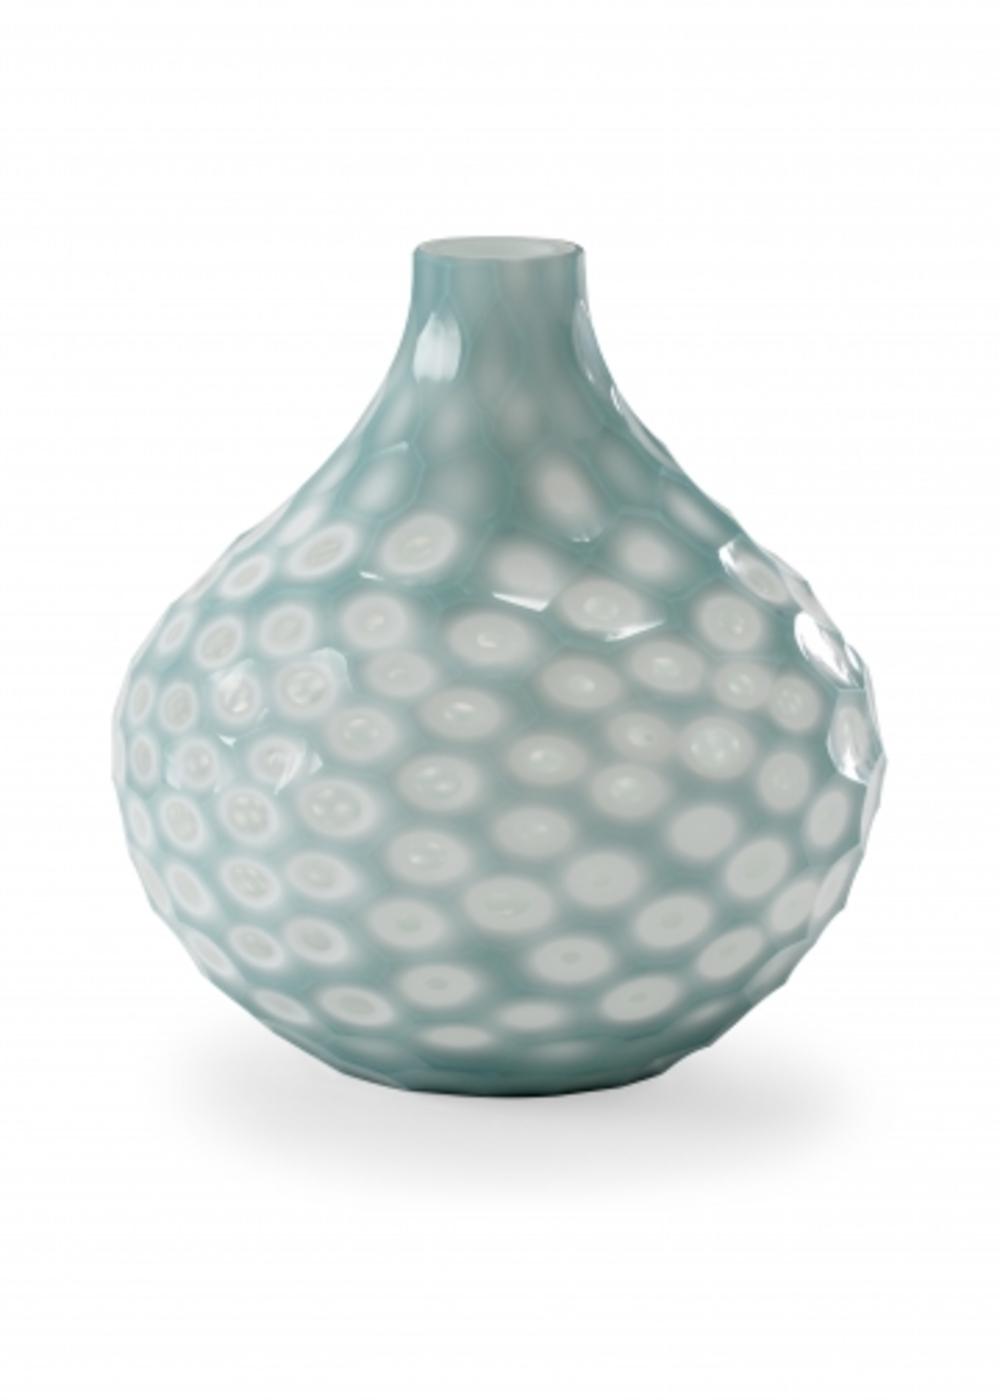 Wildwood Lamp - Lunar Vase